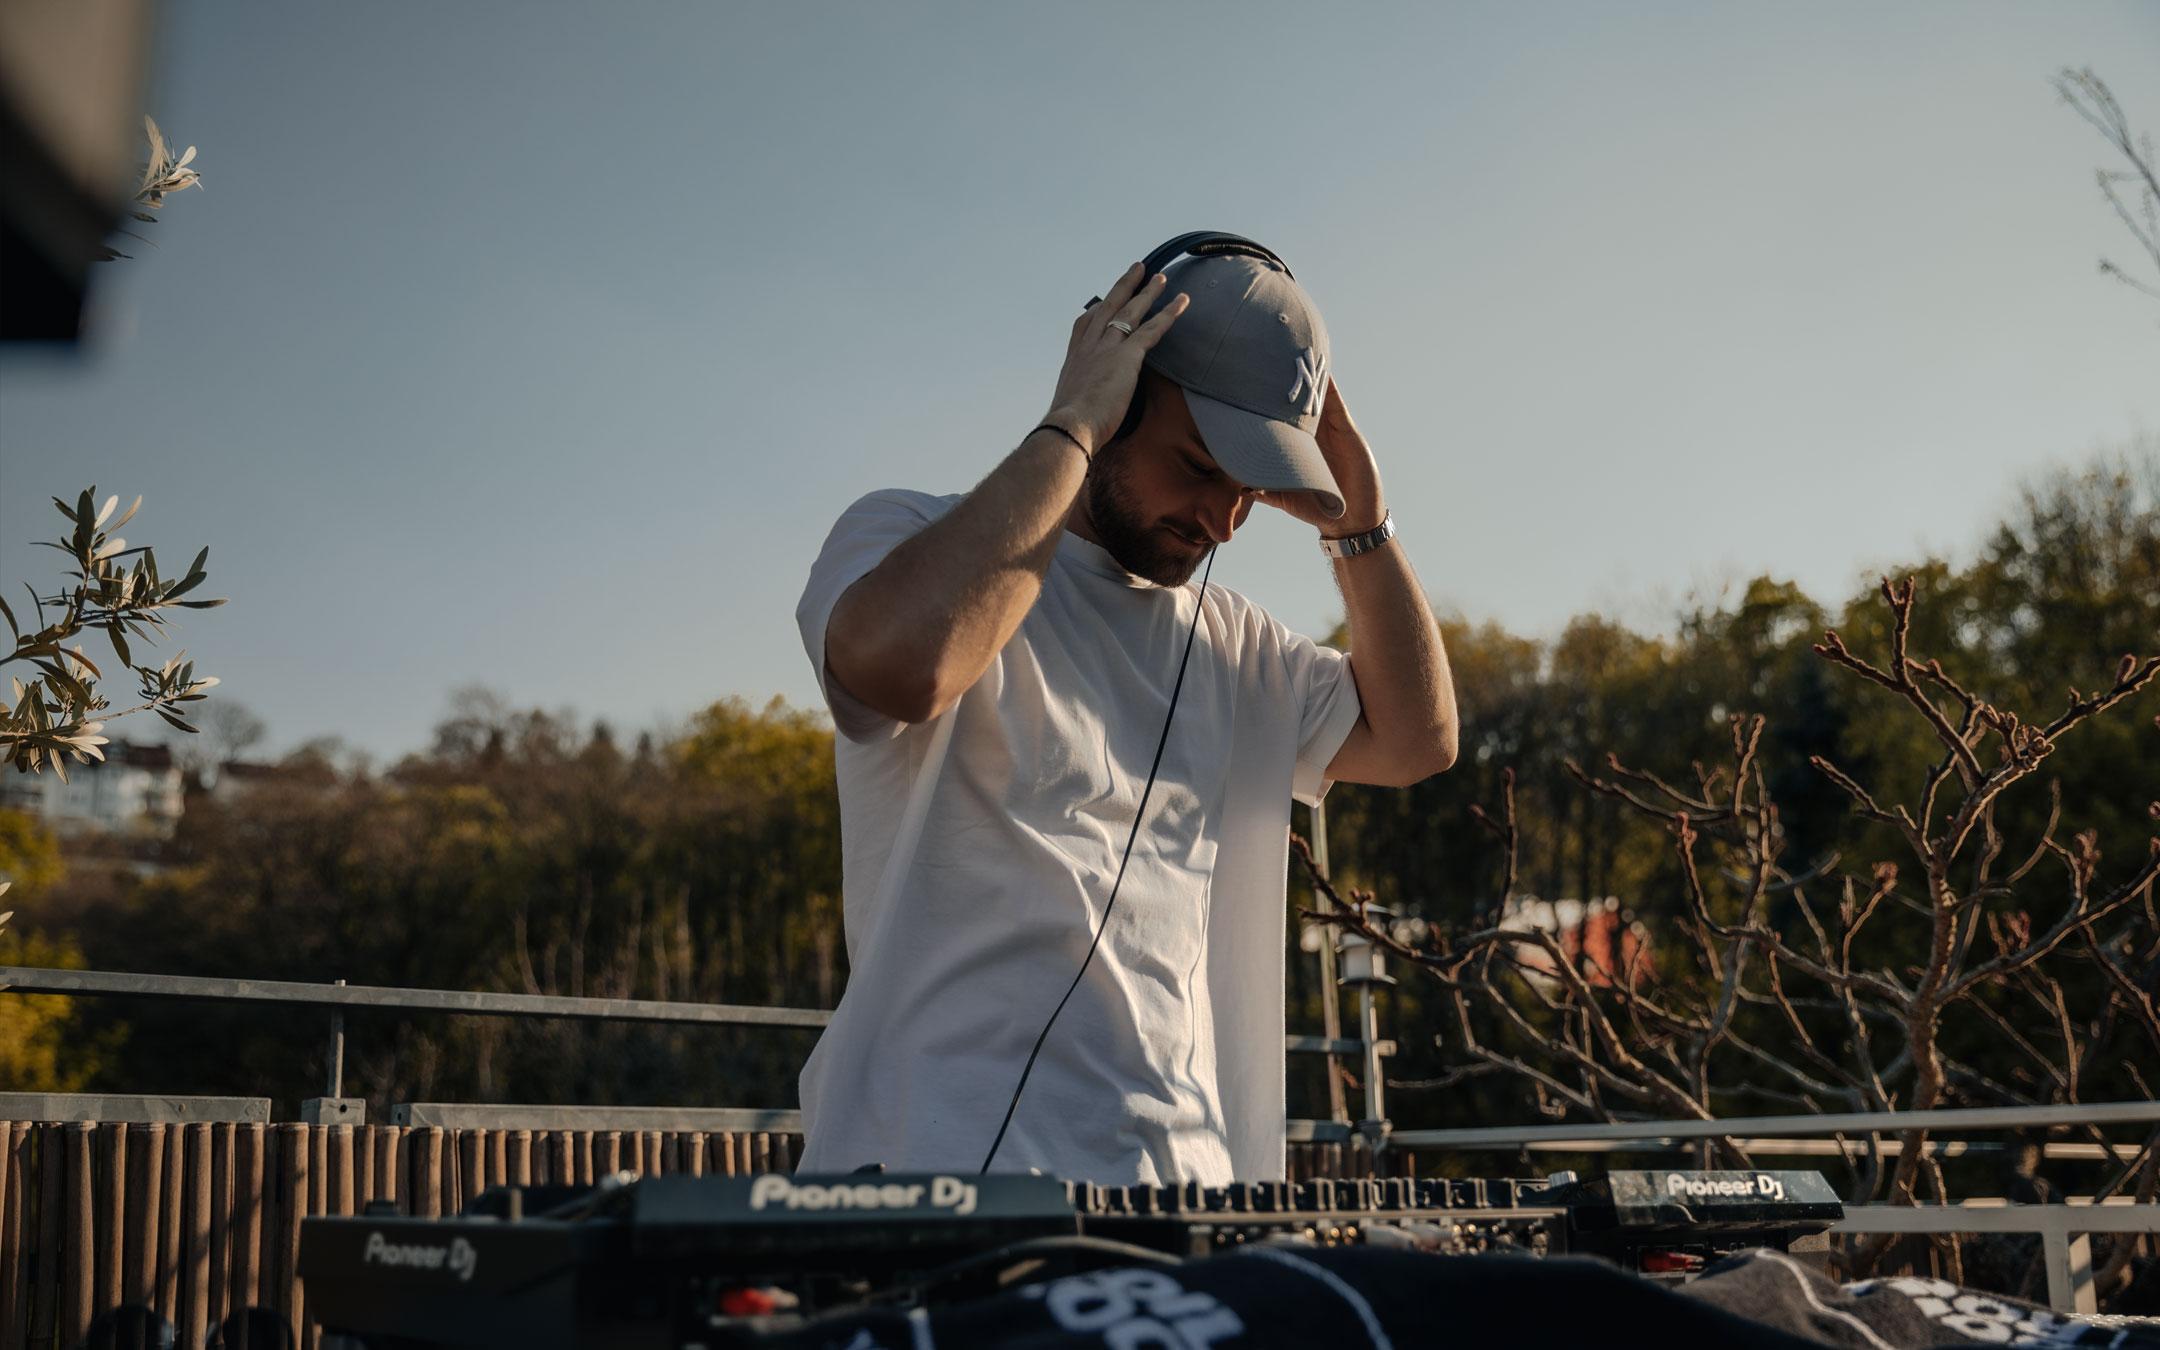 DJ-Rooftop-Live-Set-Videoproduktion-No_Synonym-Stuttgart-Corona